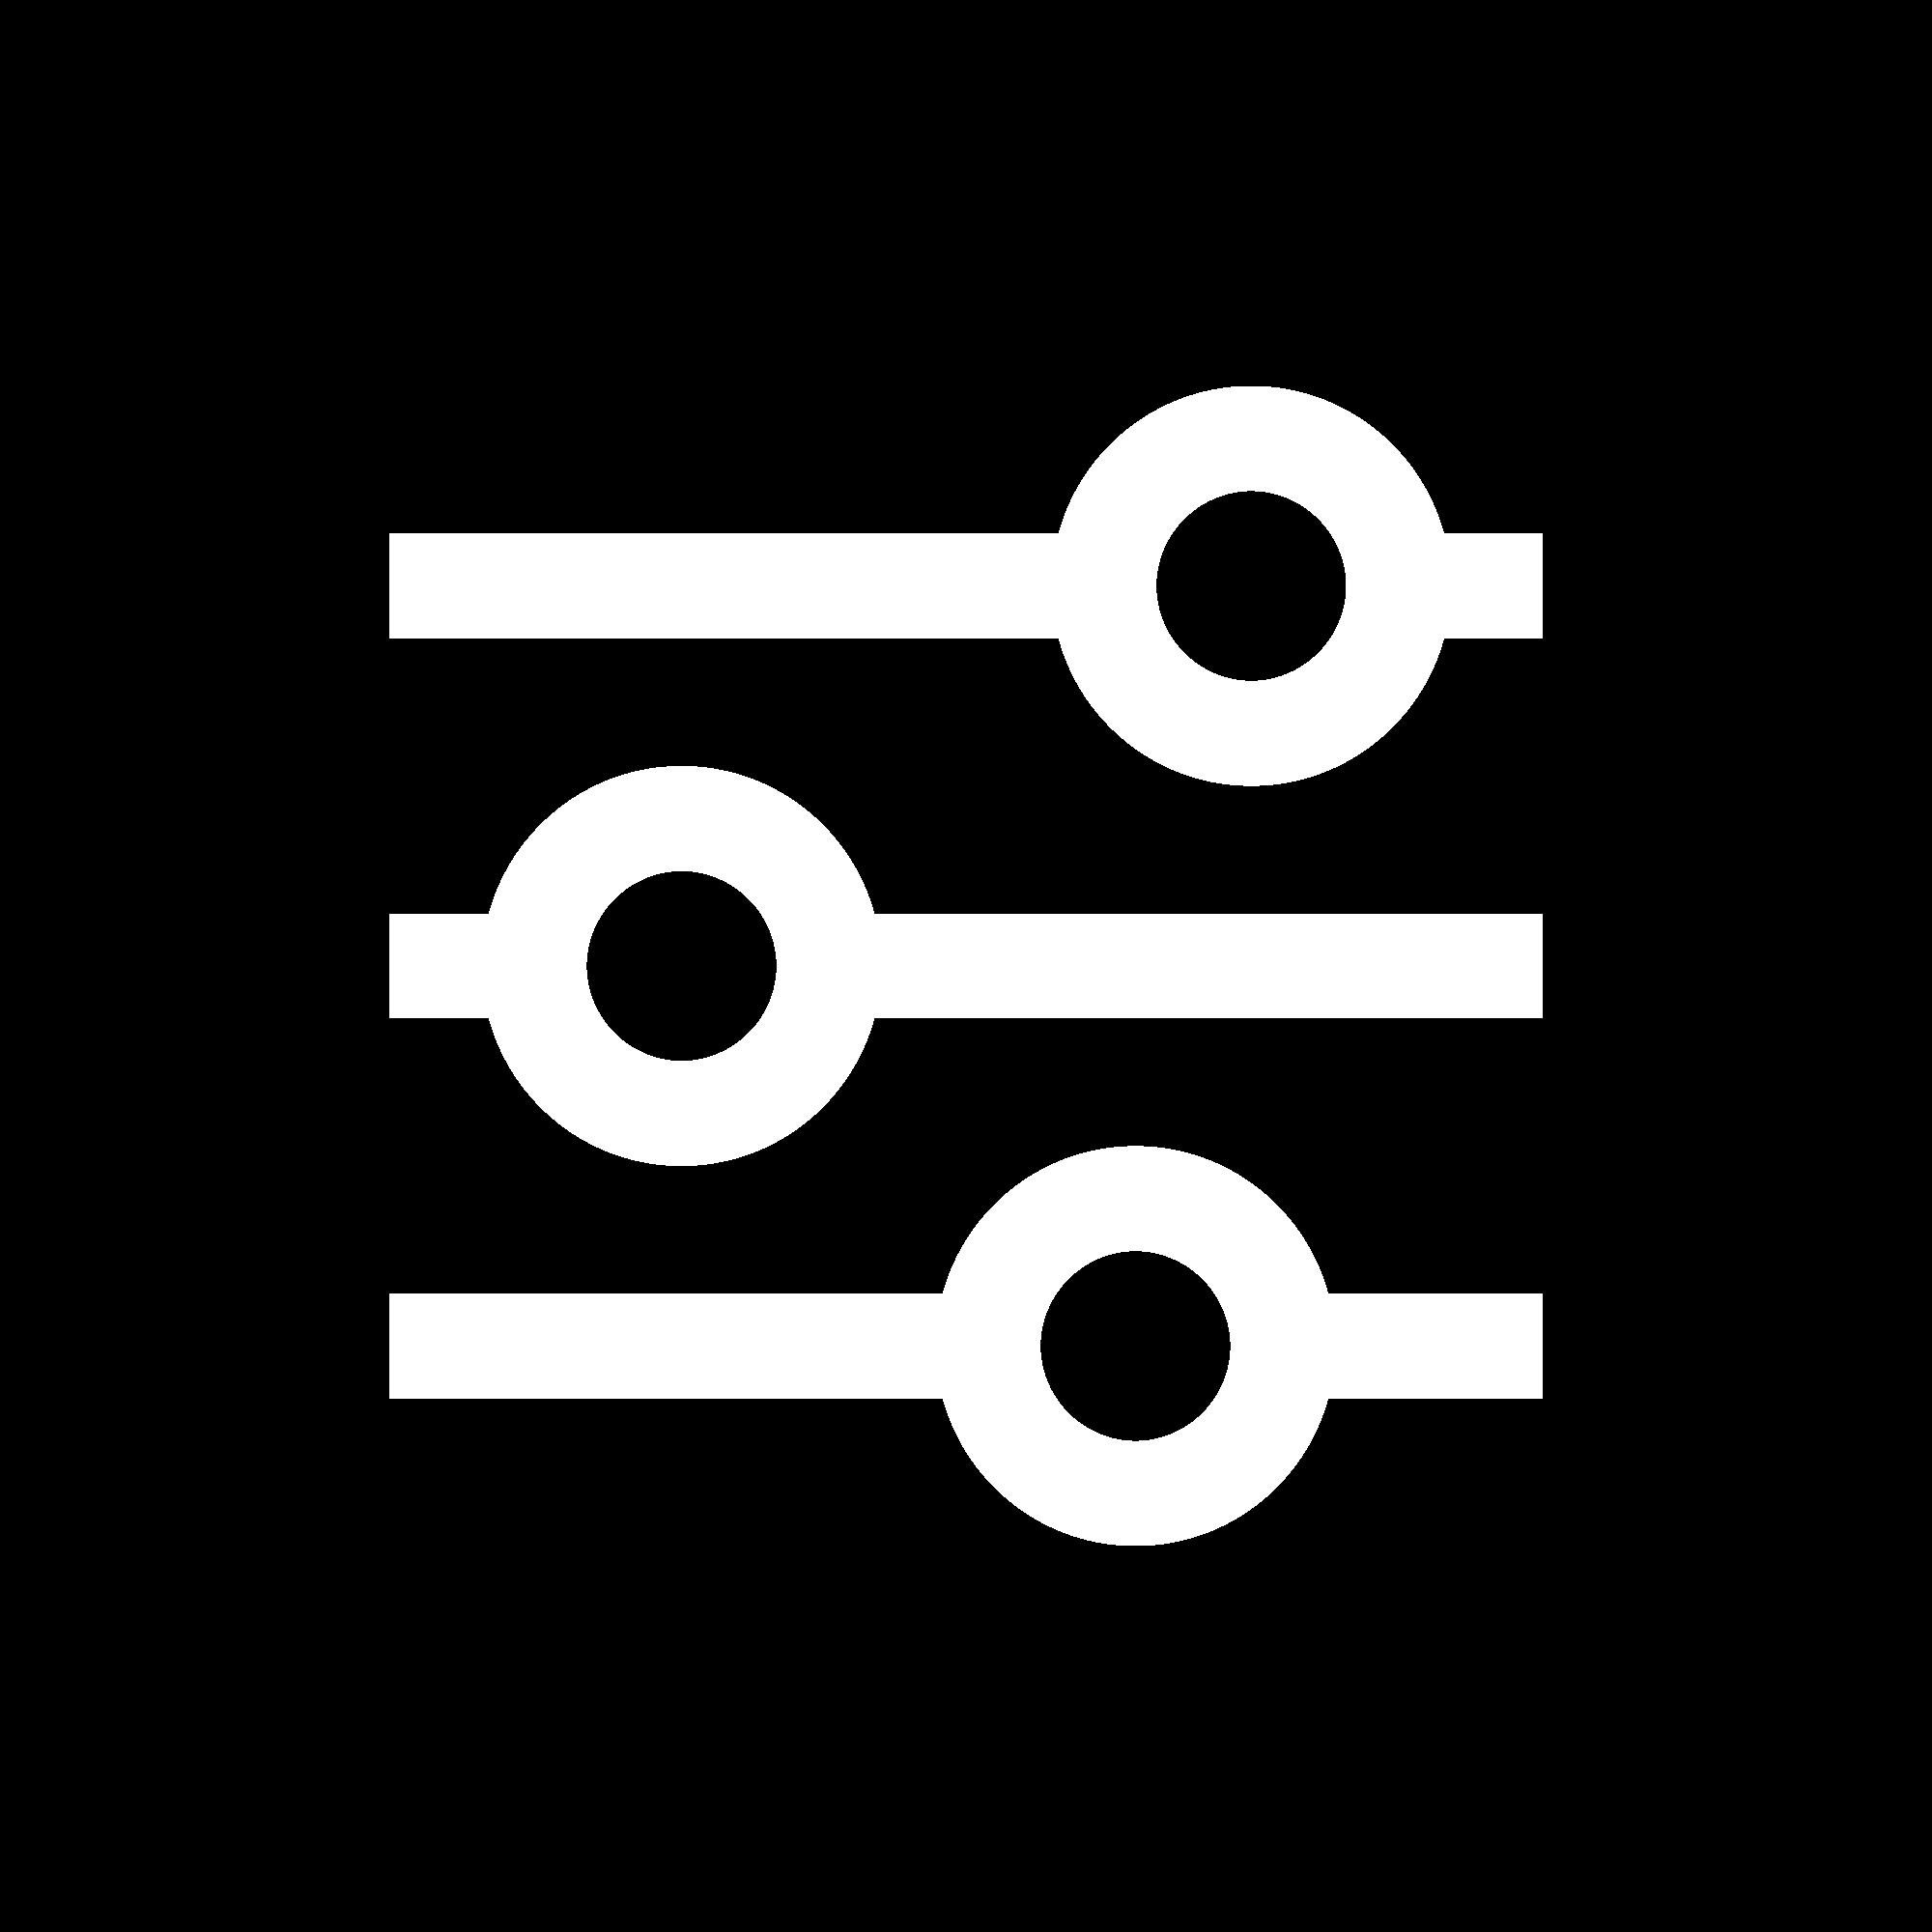 ChangeWhatYouCan_White_RGB (1)